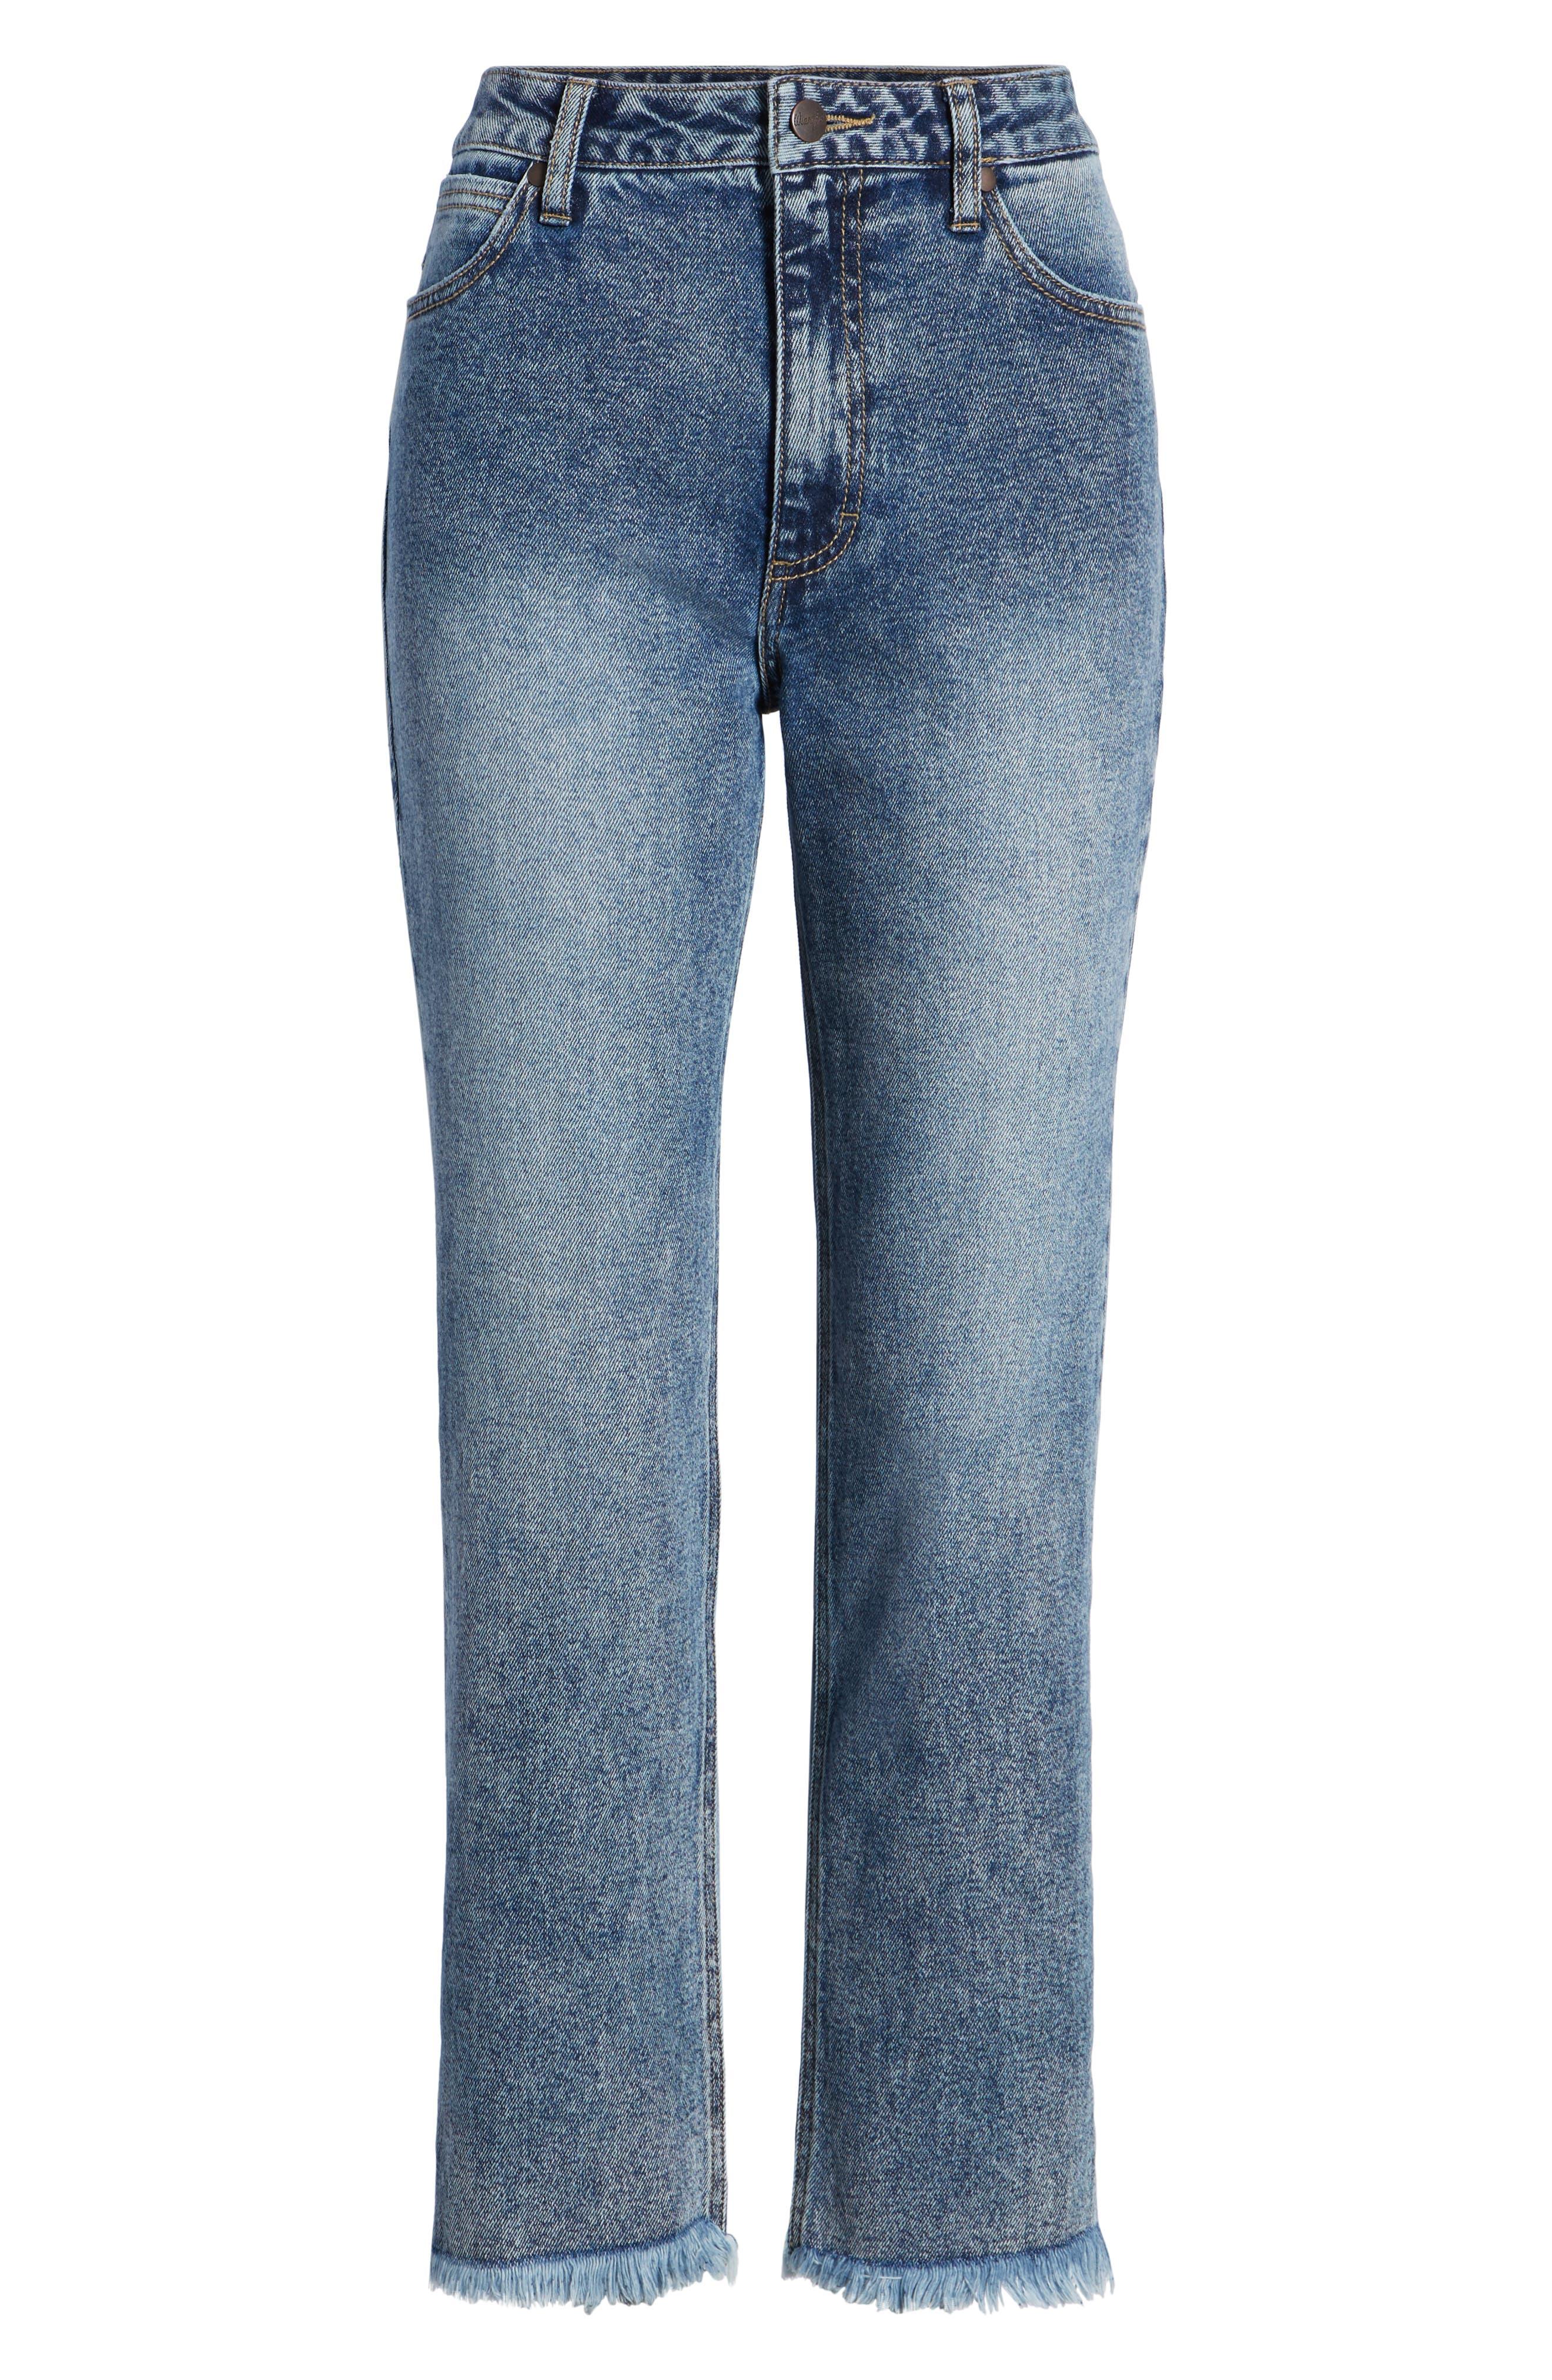 Acid Wash High Waist Crop Jeans,                             Alternate thumbnail 6, color,                             Dark Acid